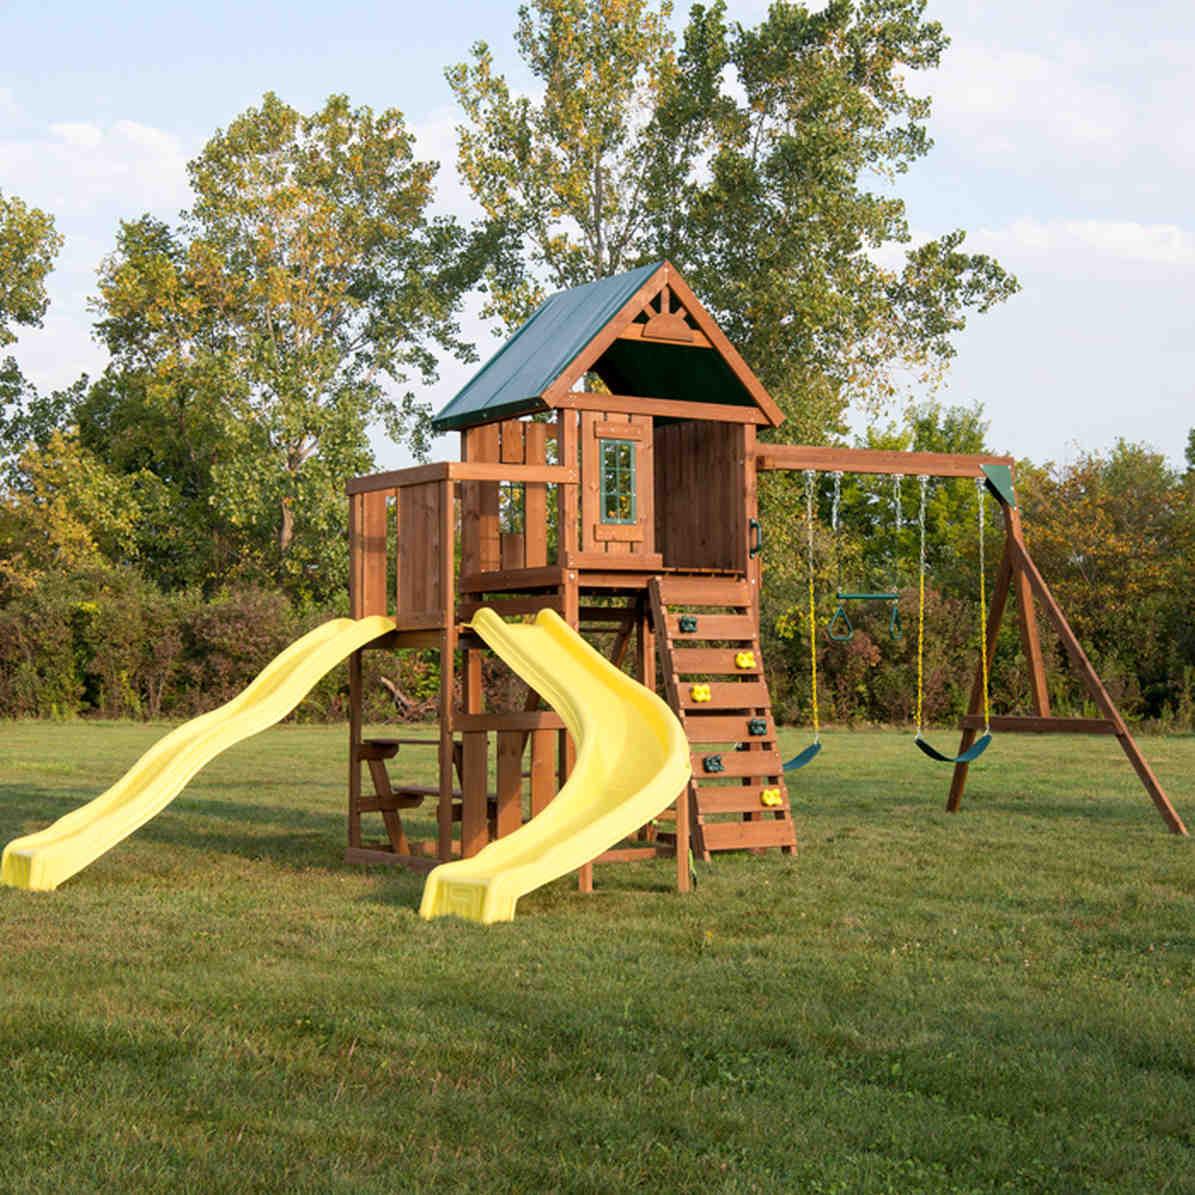 Castlebrook Complete Swing Set (WS-8355)